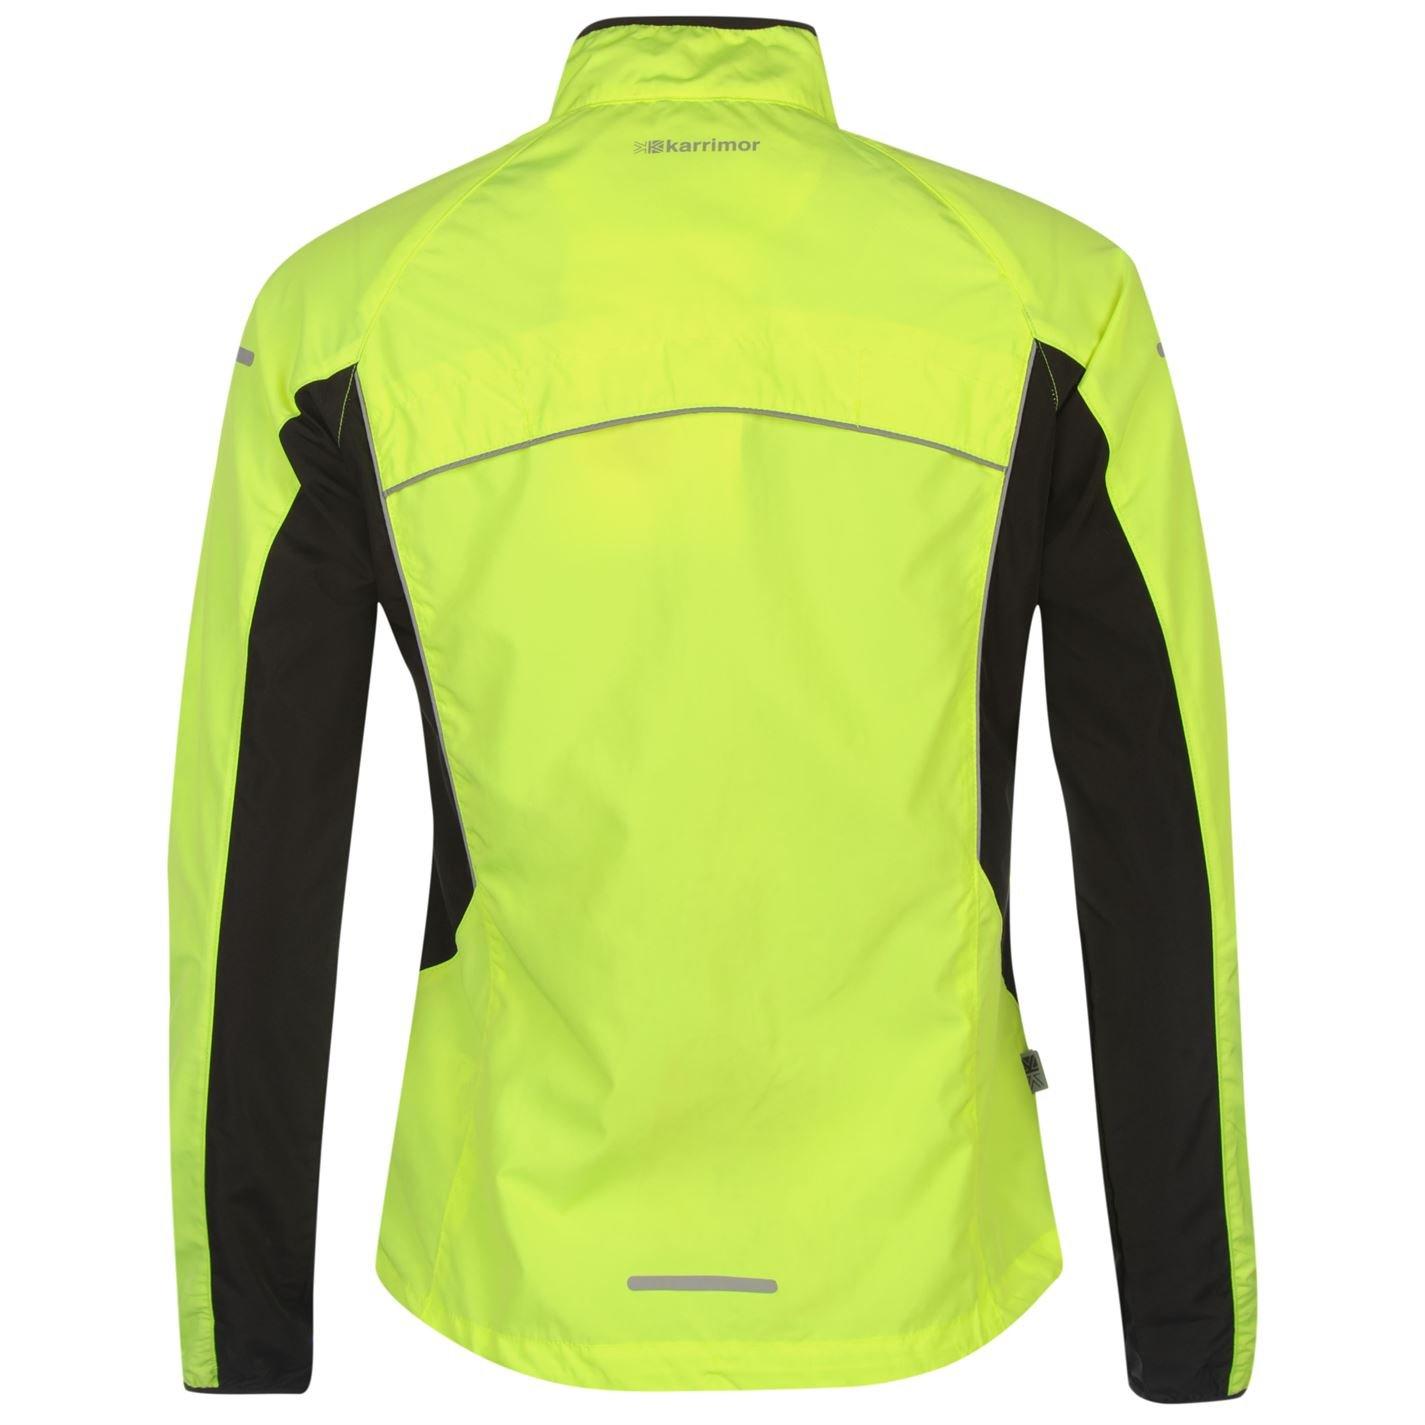 Karrimor Womens Running Jacket Fluo Coral 14 (L)  Amazon.co.uk  Clothing fe759909be5